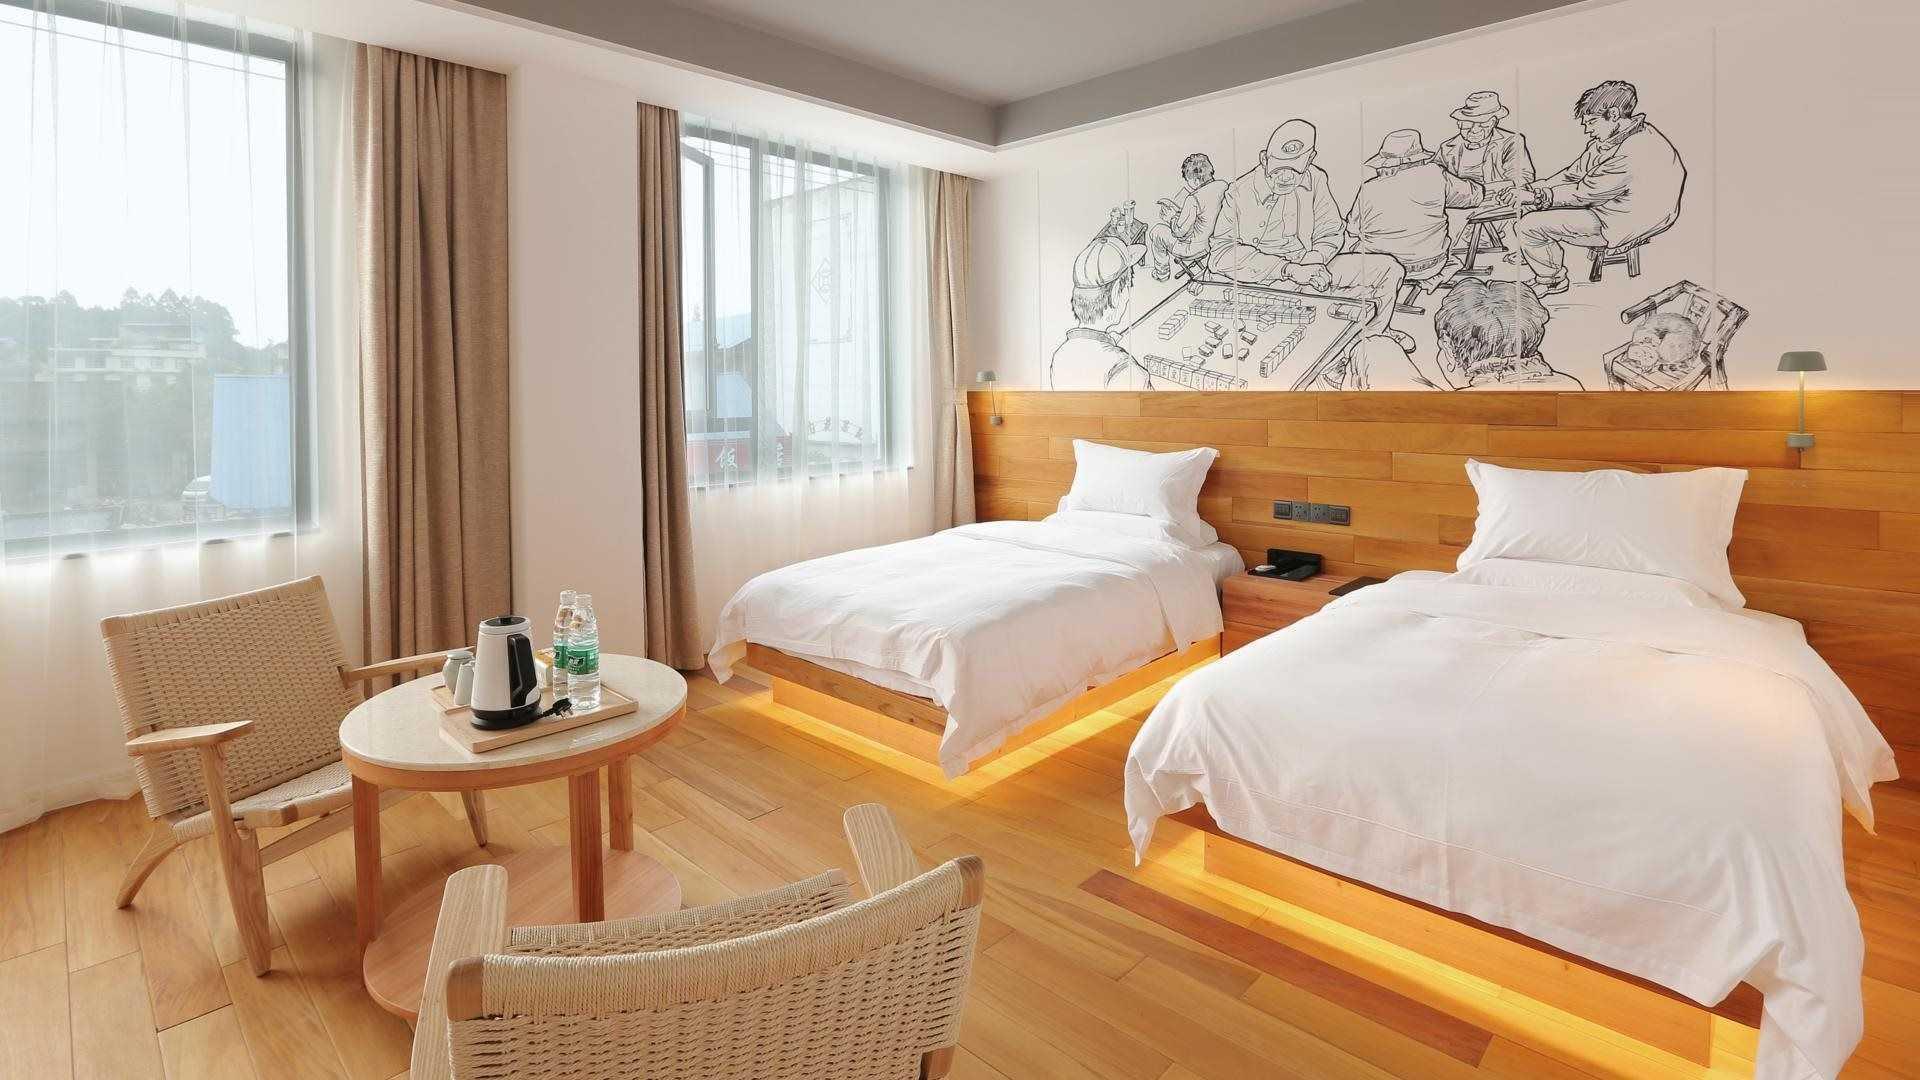 Shuzhongyi Travelling with Hotel -